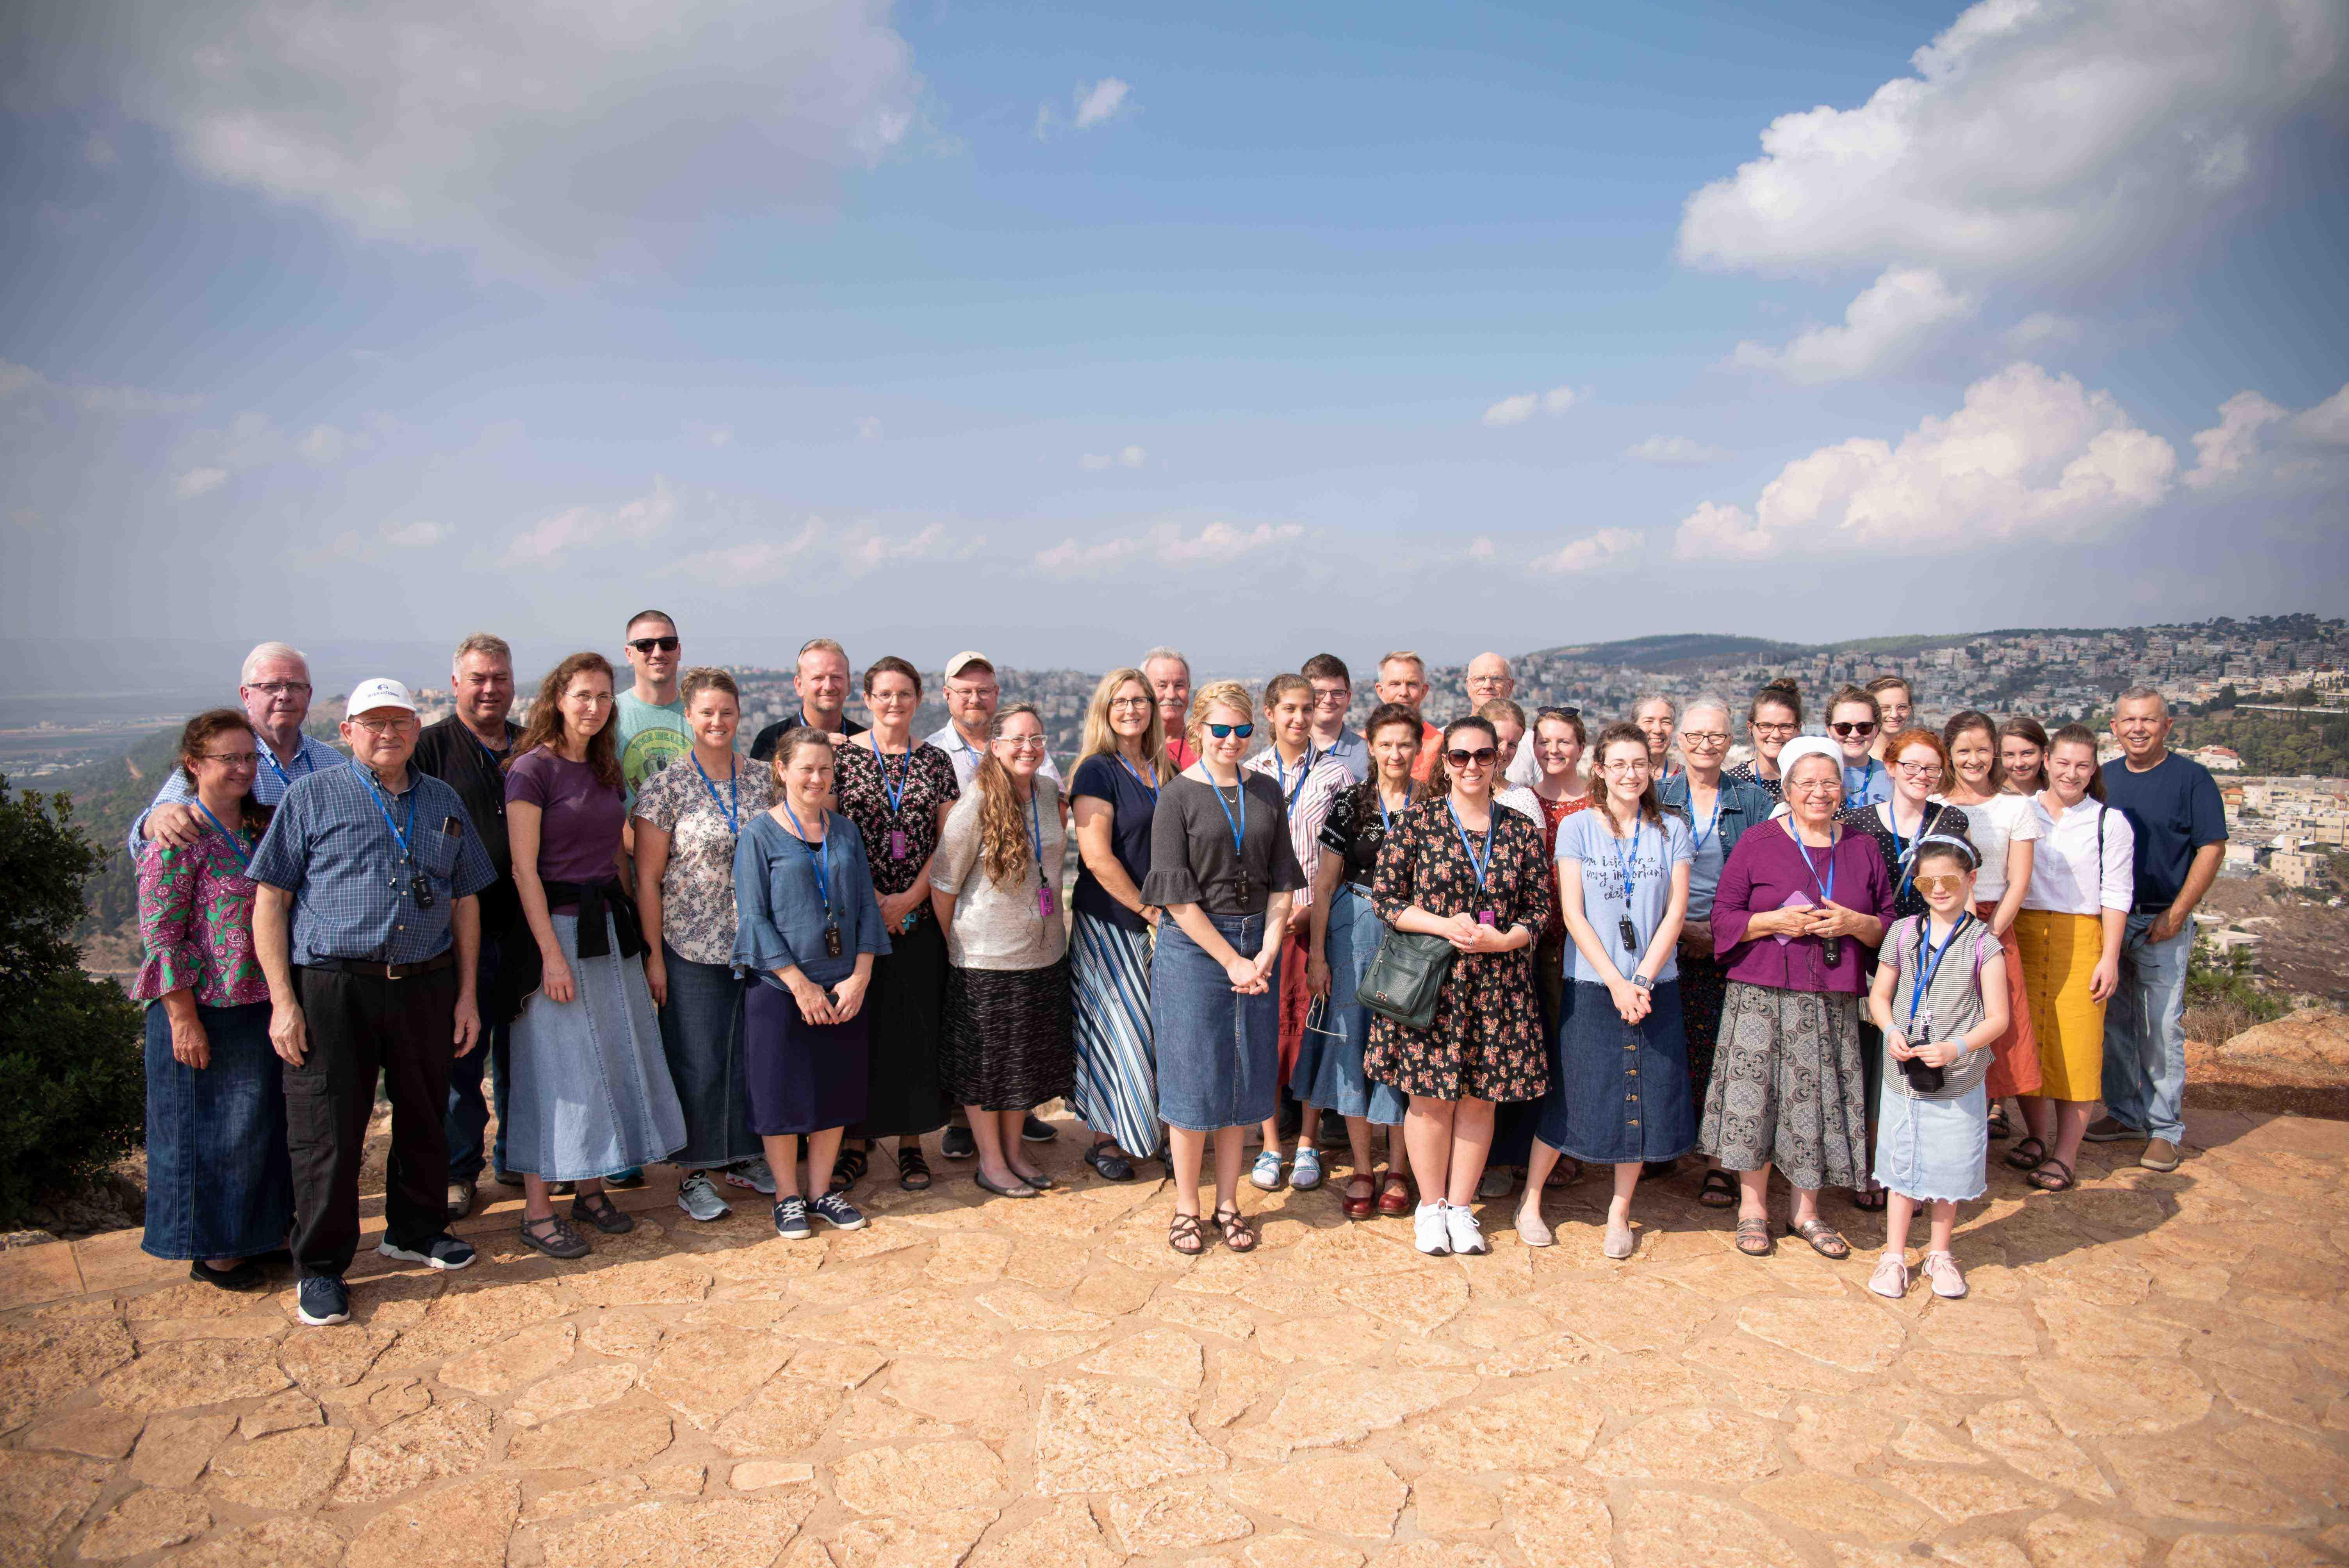 ISRAEL 2019 - Updates